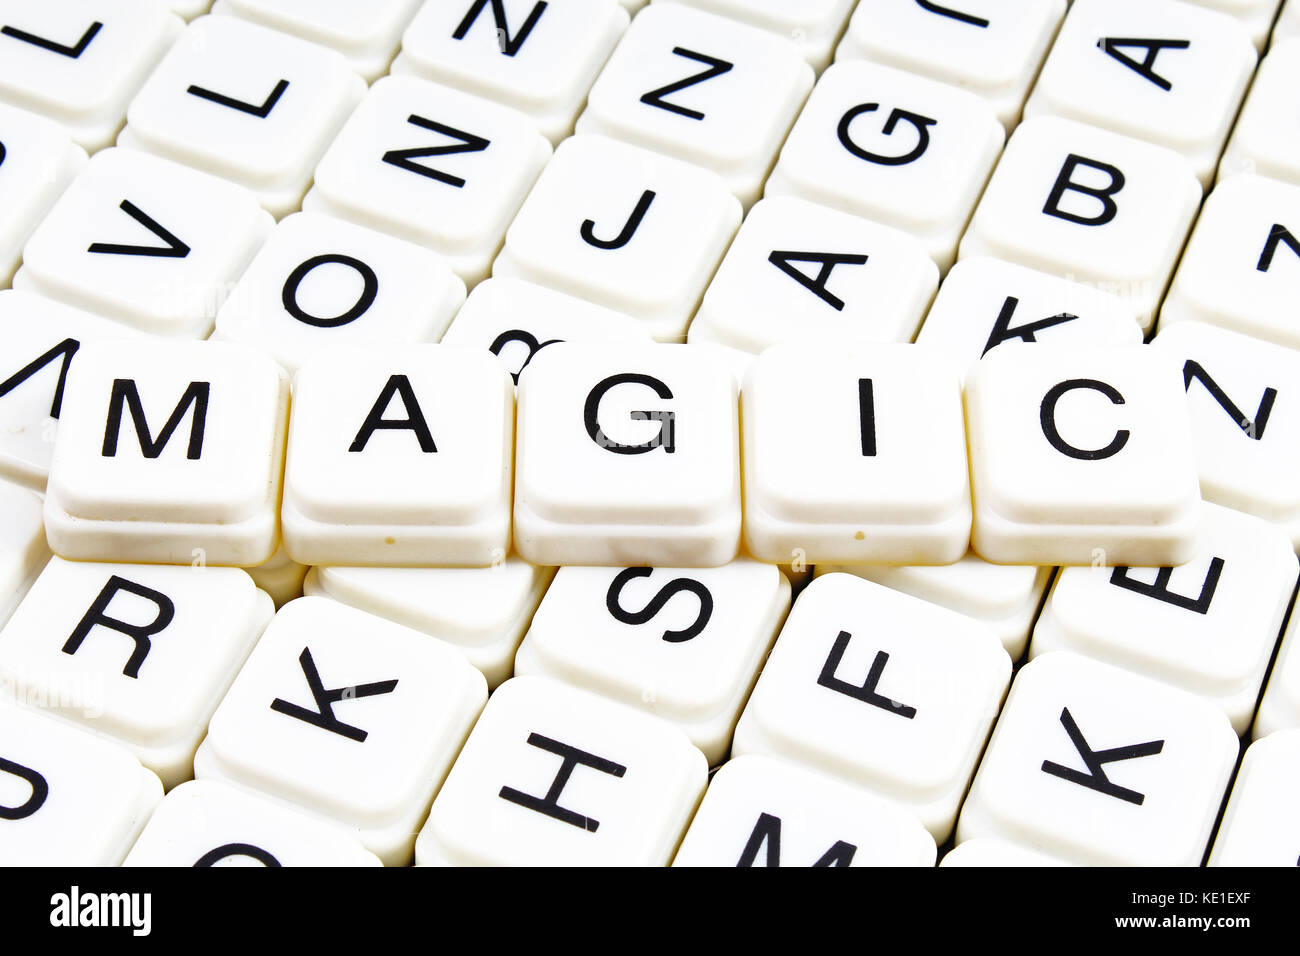 Magic Text wort Kreuzworträtsel. Schreiben Alphabet blocks Spiel ...